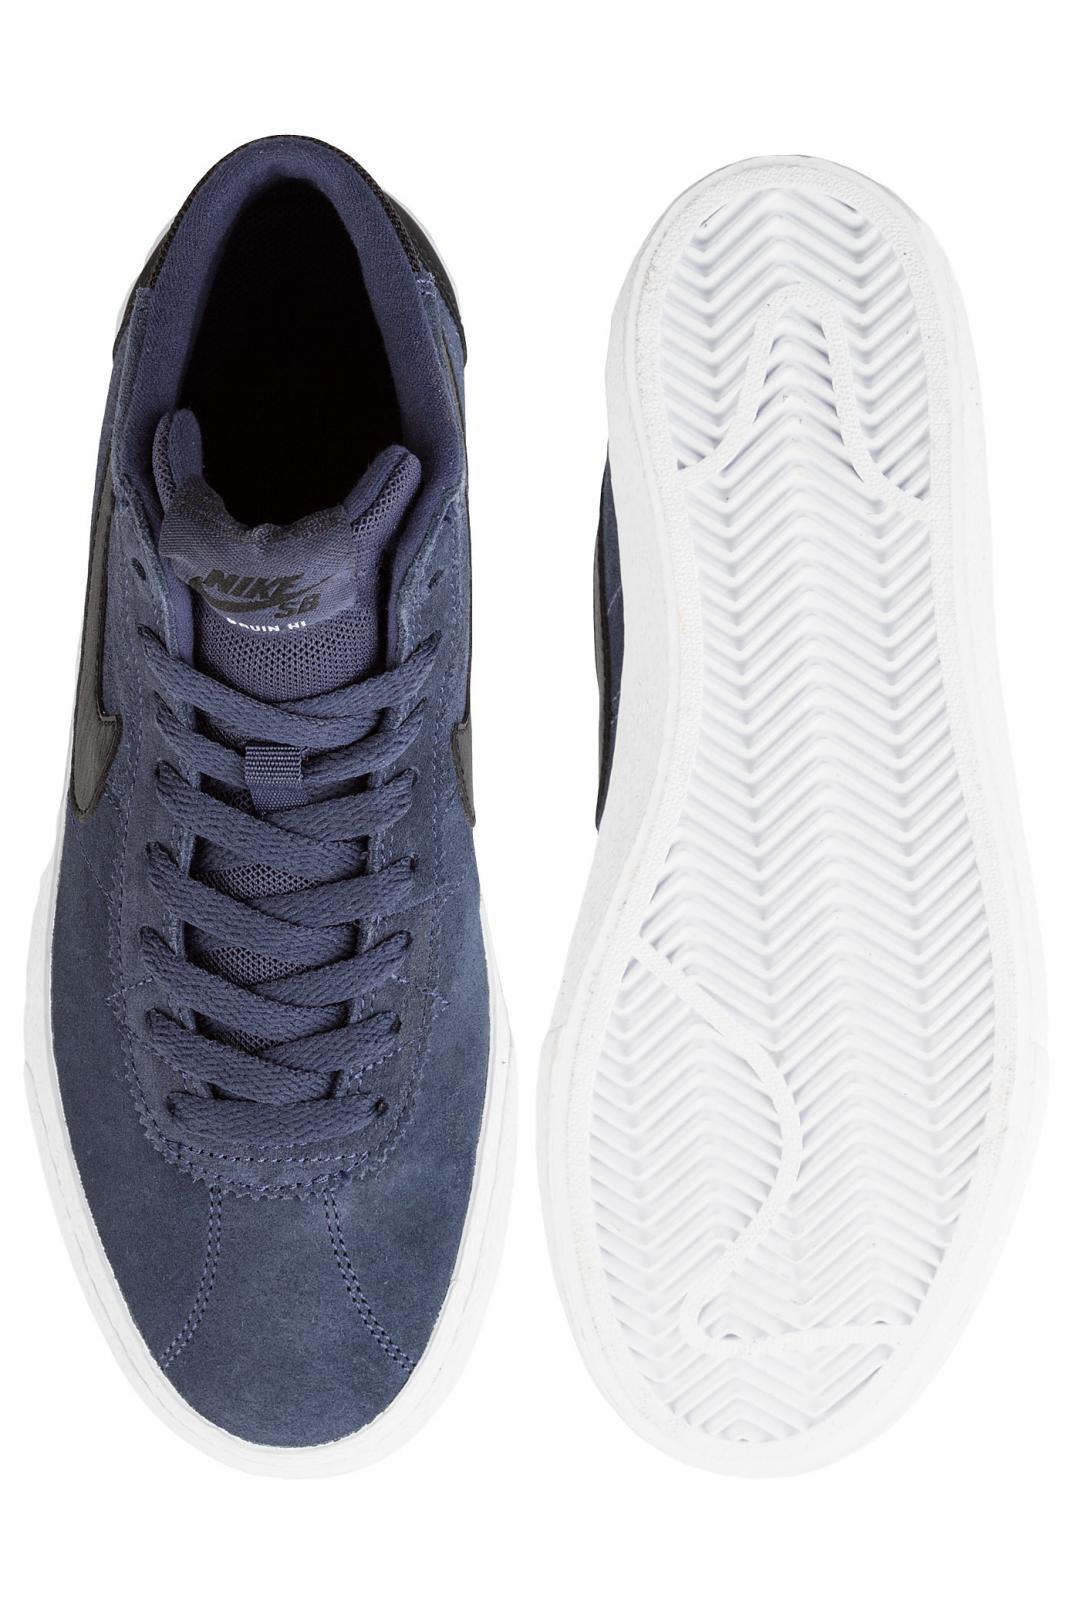 Donna Nike SB Bruin High thunder blue black | Sneakers high top